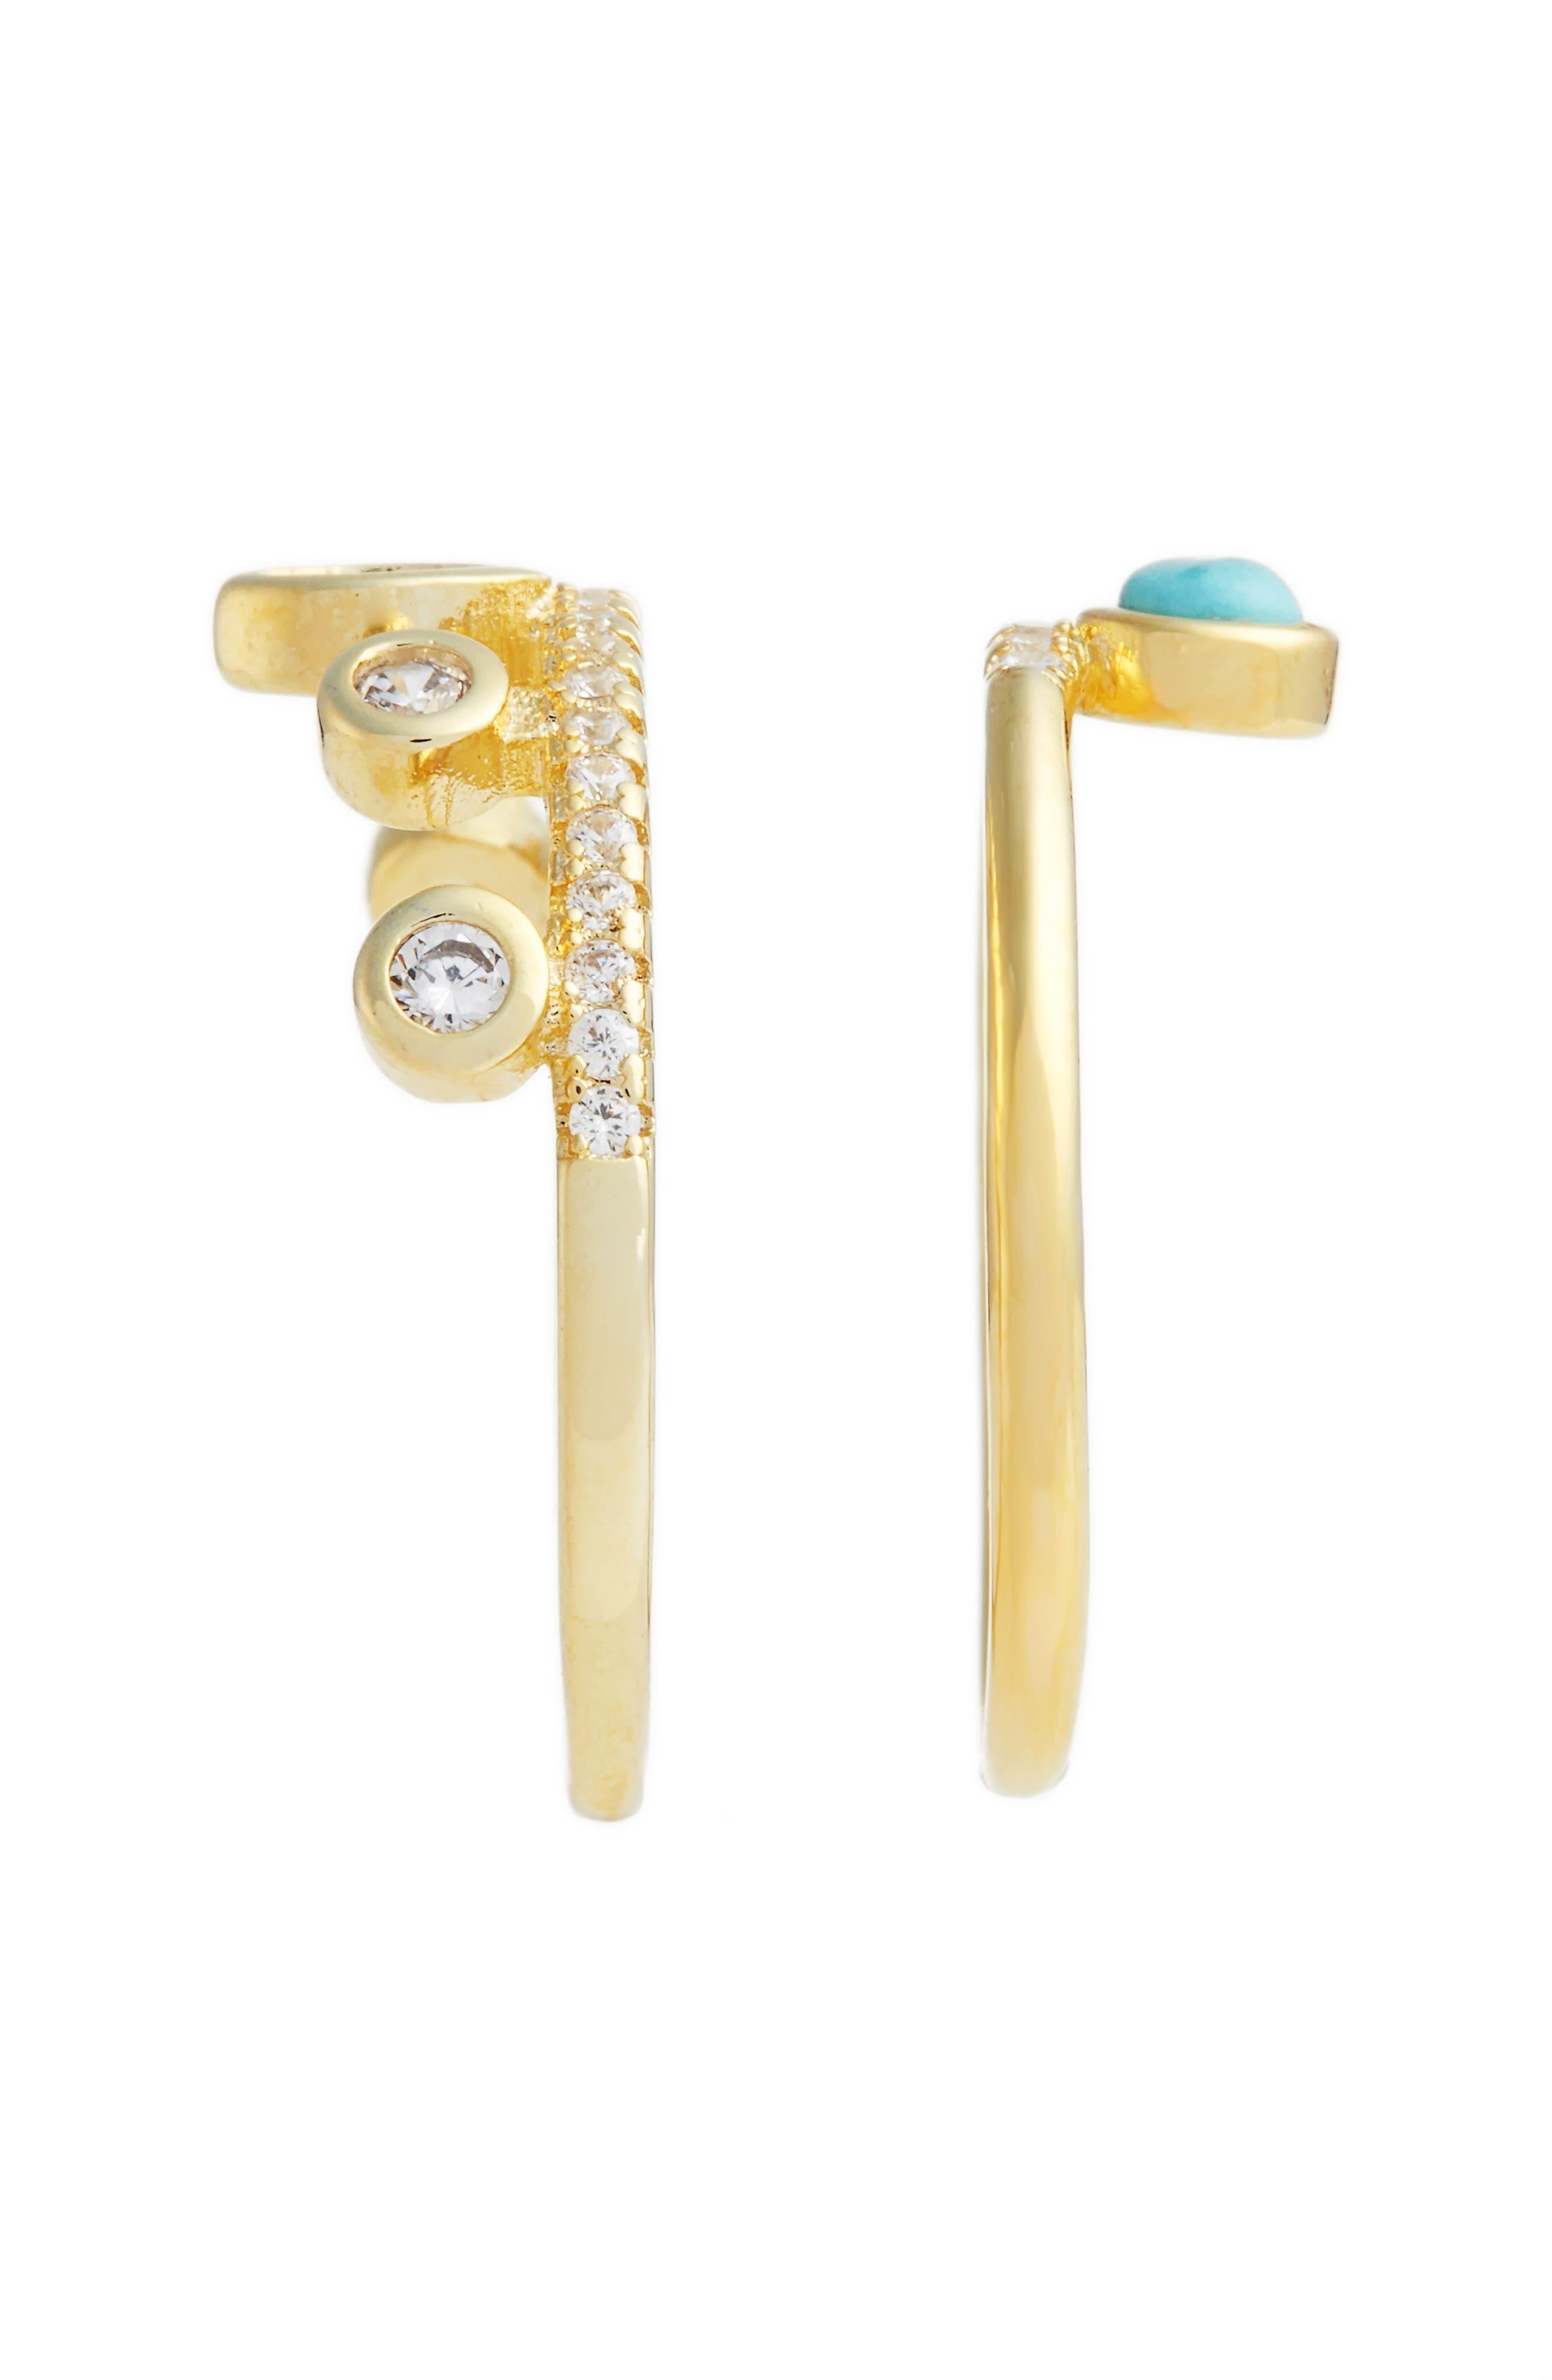 Jacinta Set of 2 Turquoise & Crystal Rings,                             Alternate thumbnail 2, color,                             Gold